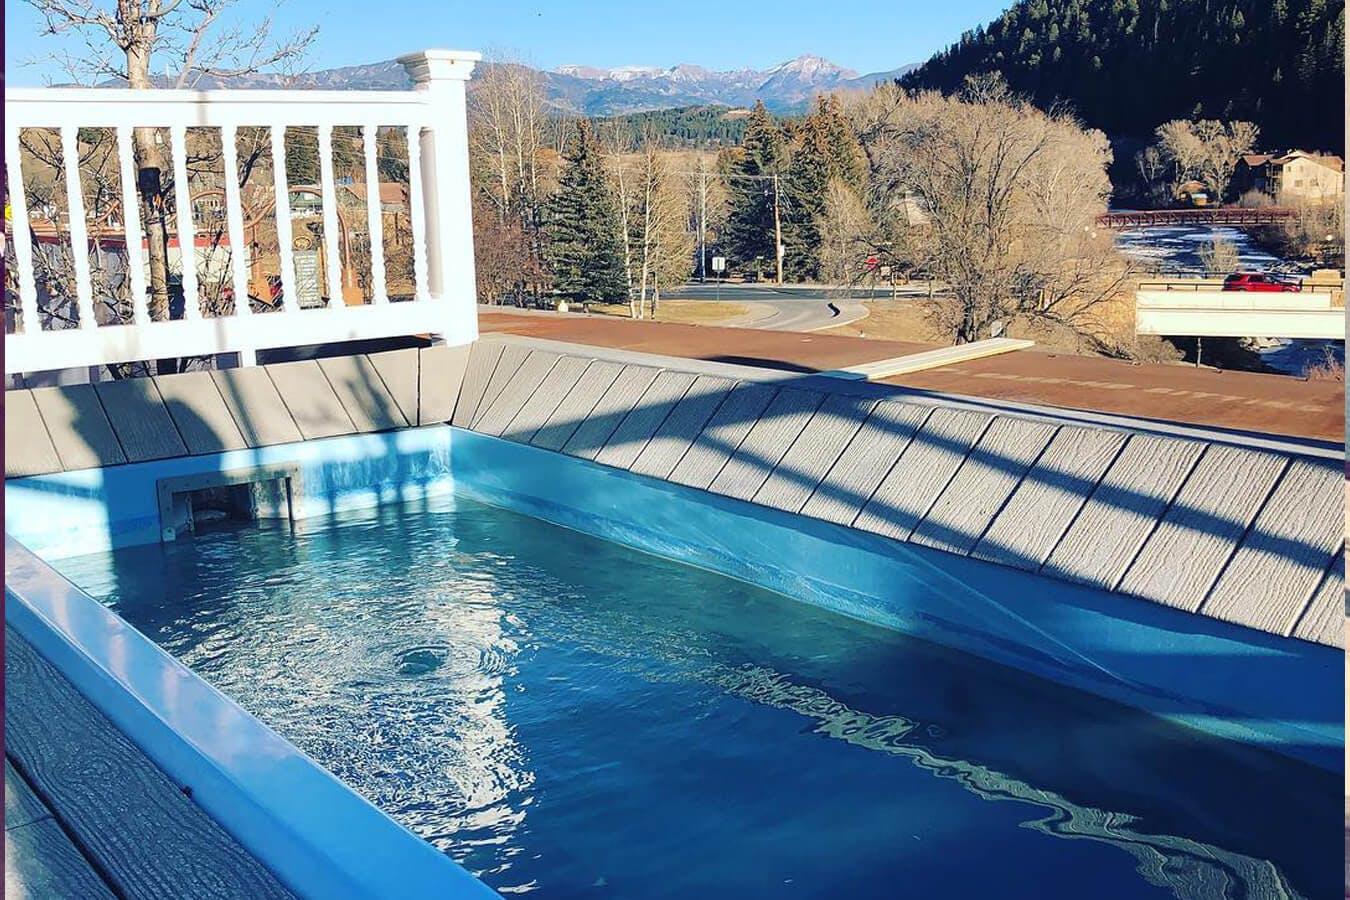 Overlook Hot Springs located in Colorado